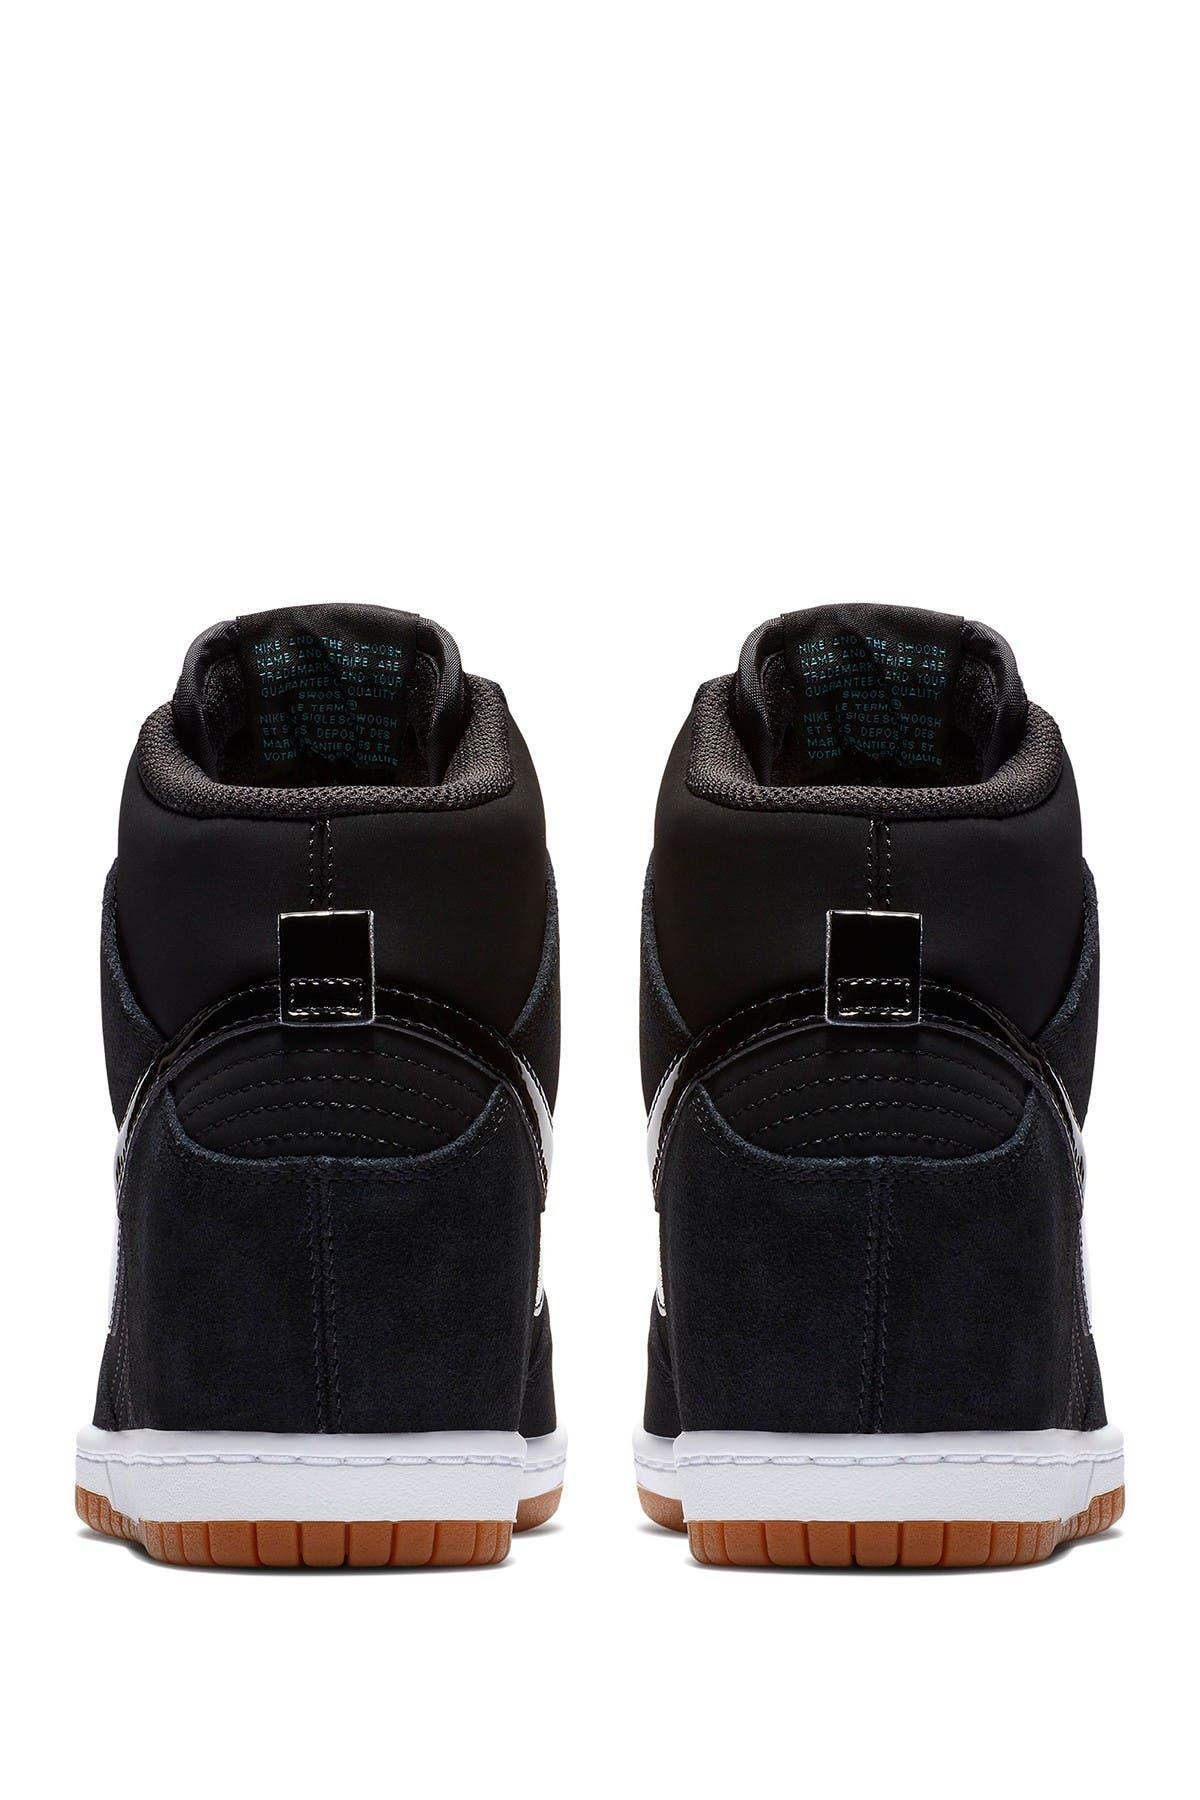 Completo Preescolar exótico  Nike | Dunk Sky Hi Essential Wedge Sneaker | Nordstrom Rack